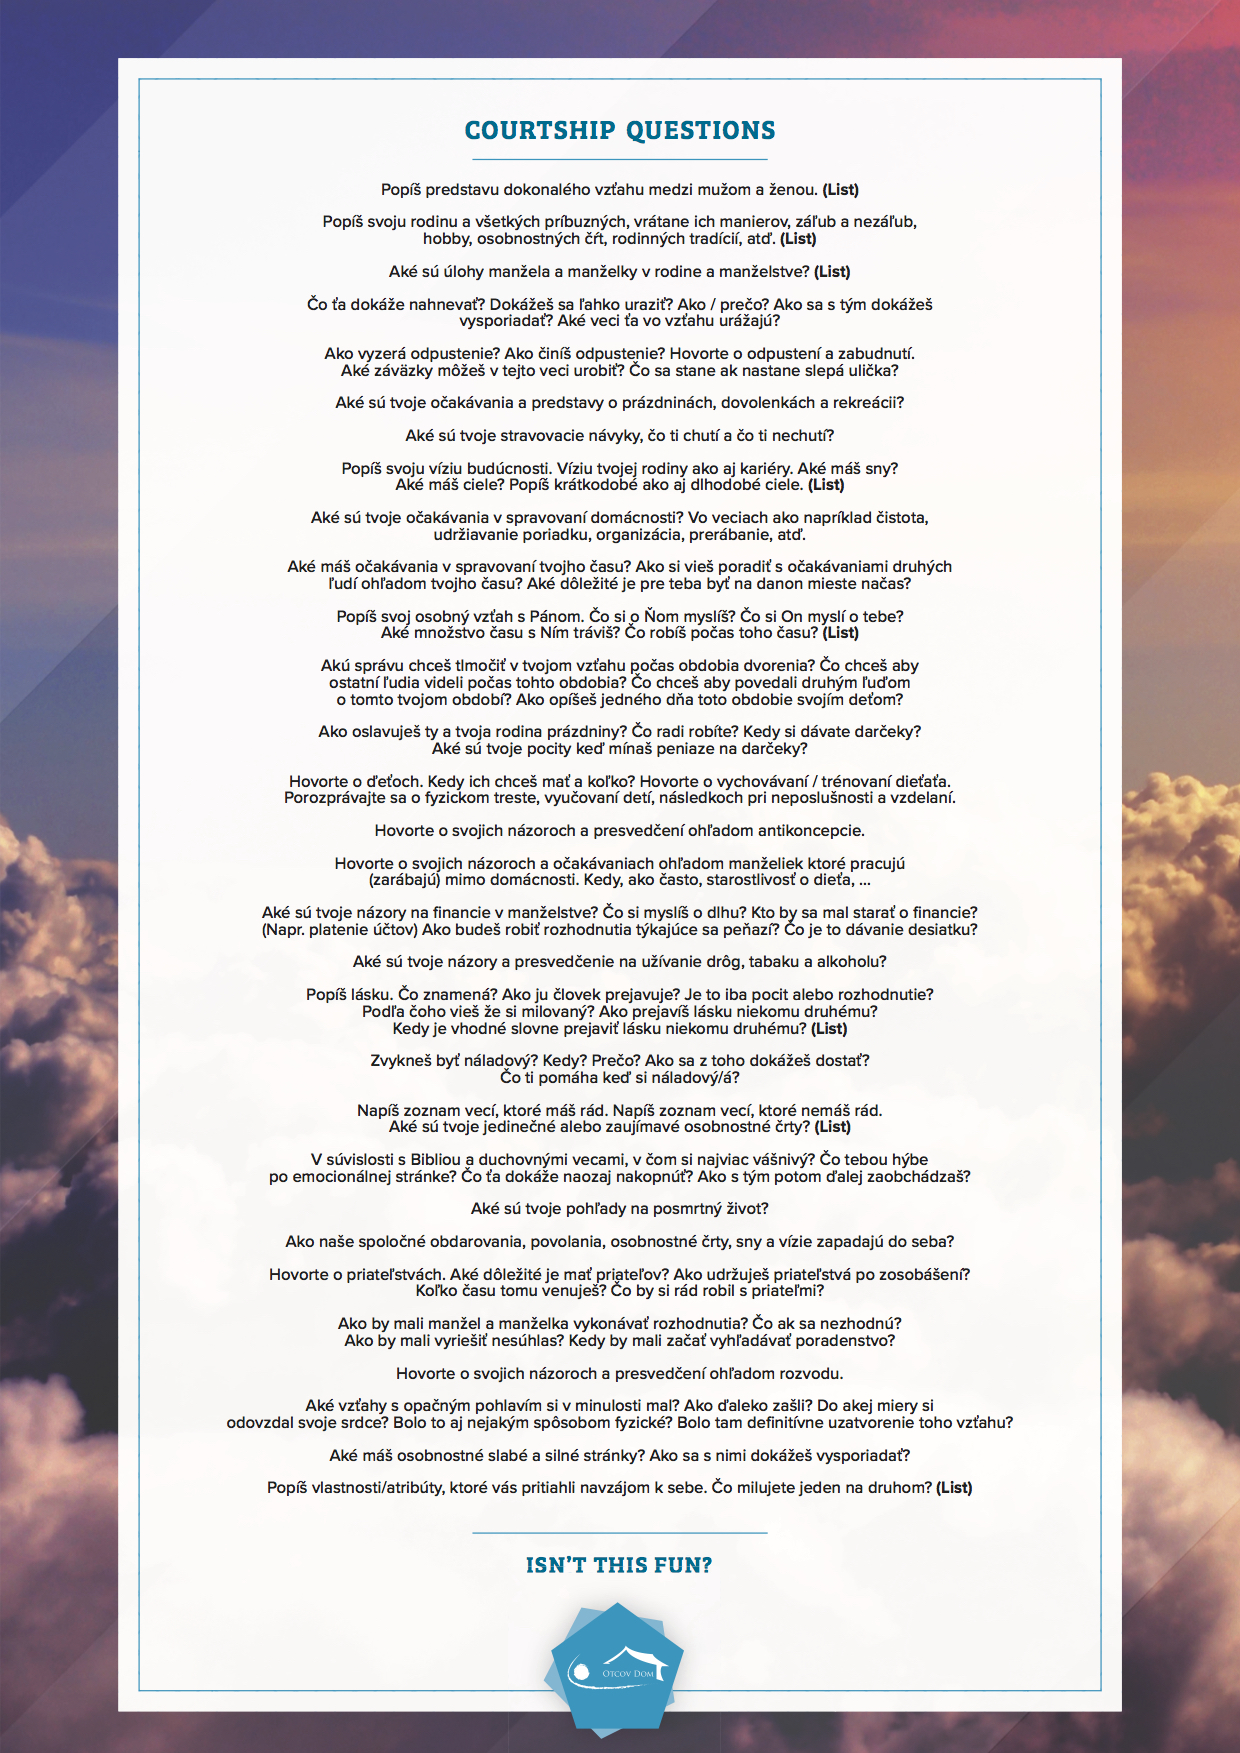 Jim_Anderson_Courtship Questions A4_Part1